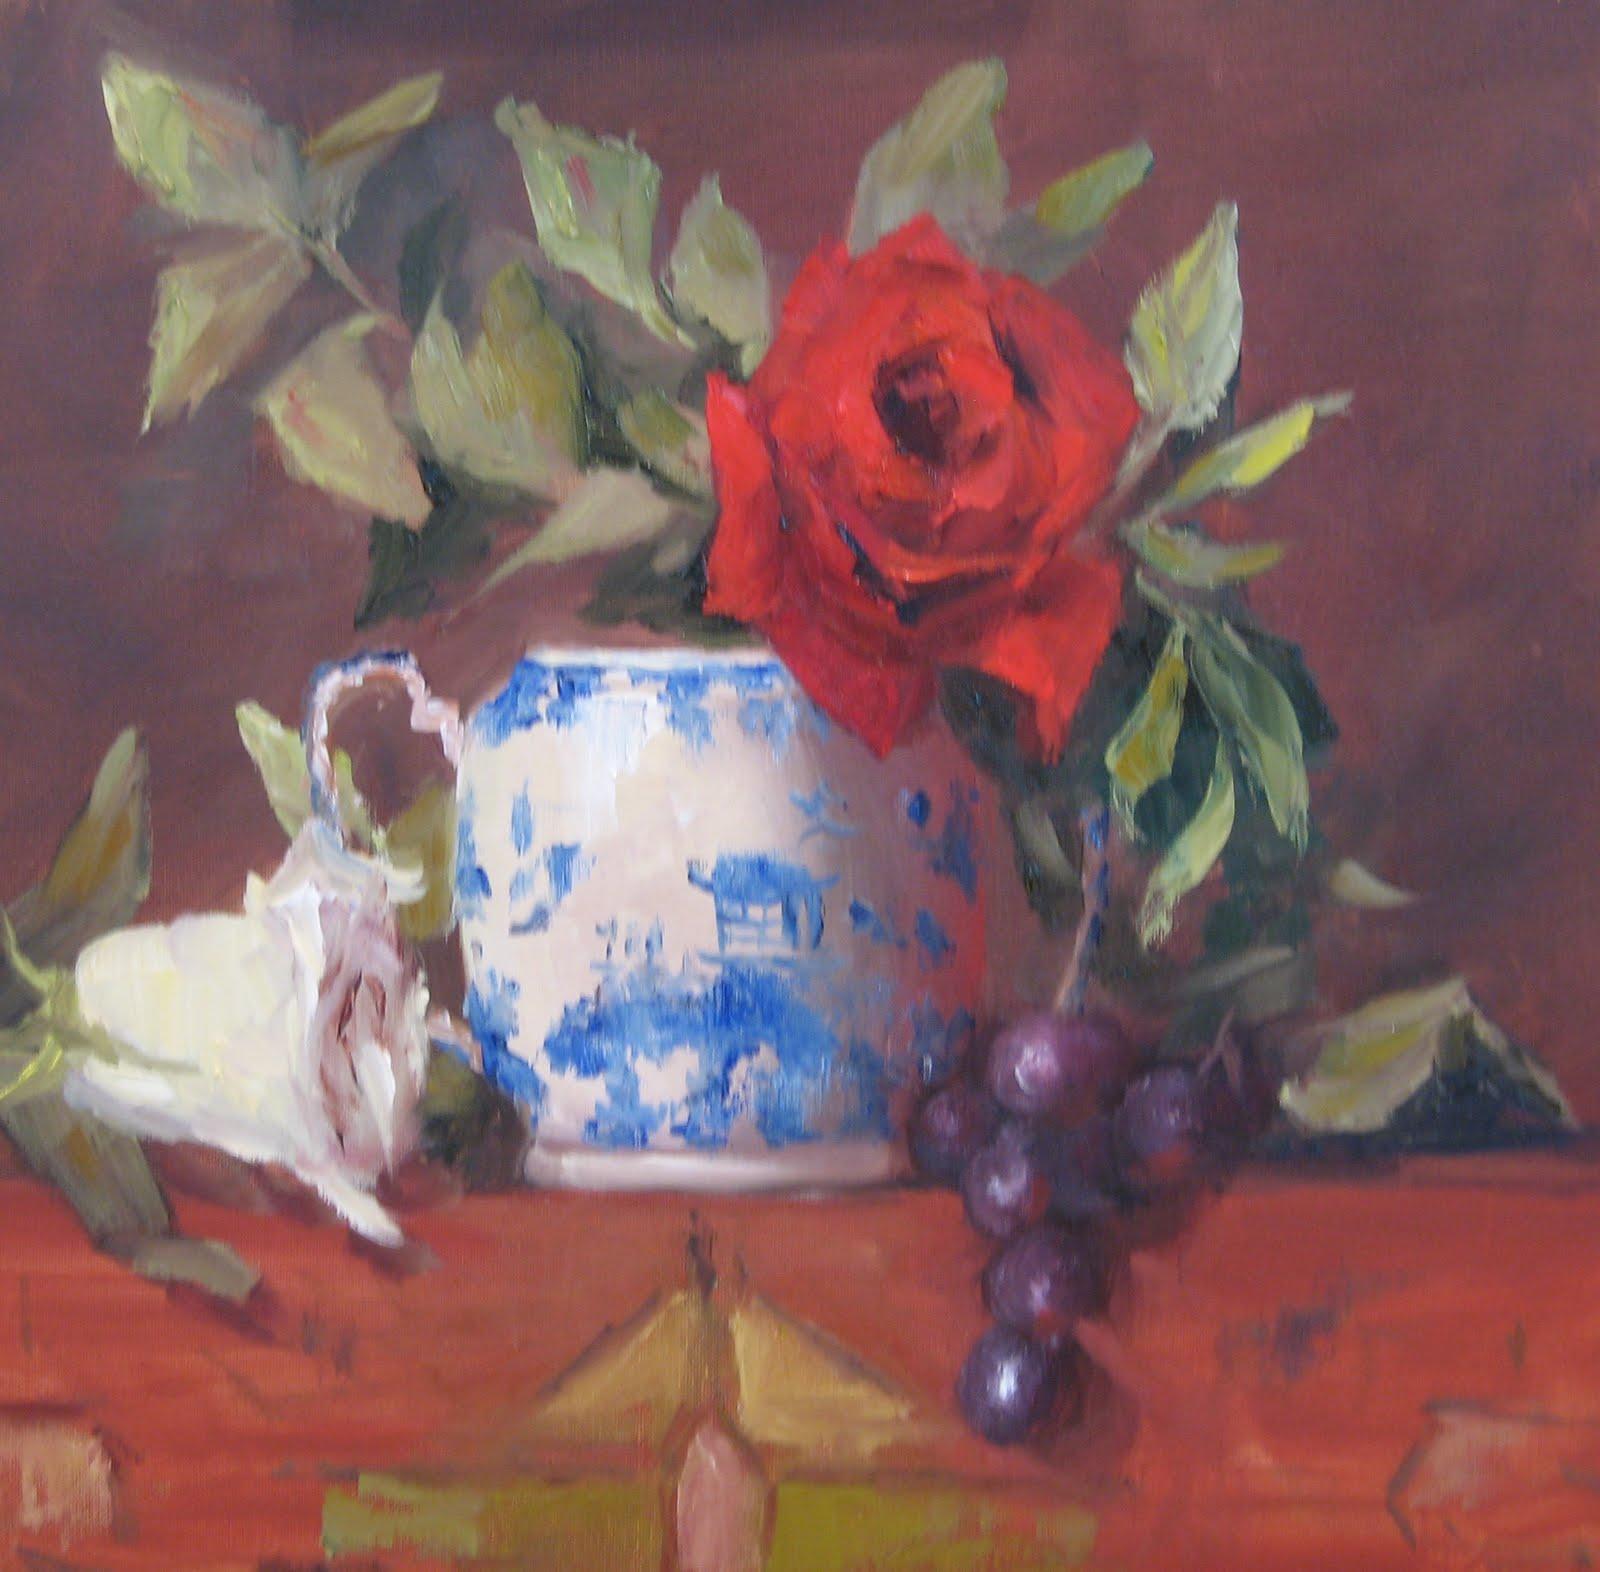 """Flower Study 19 Red Rose Blue Willow"" original fine art by Pat Fiorello"